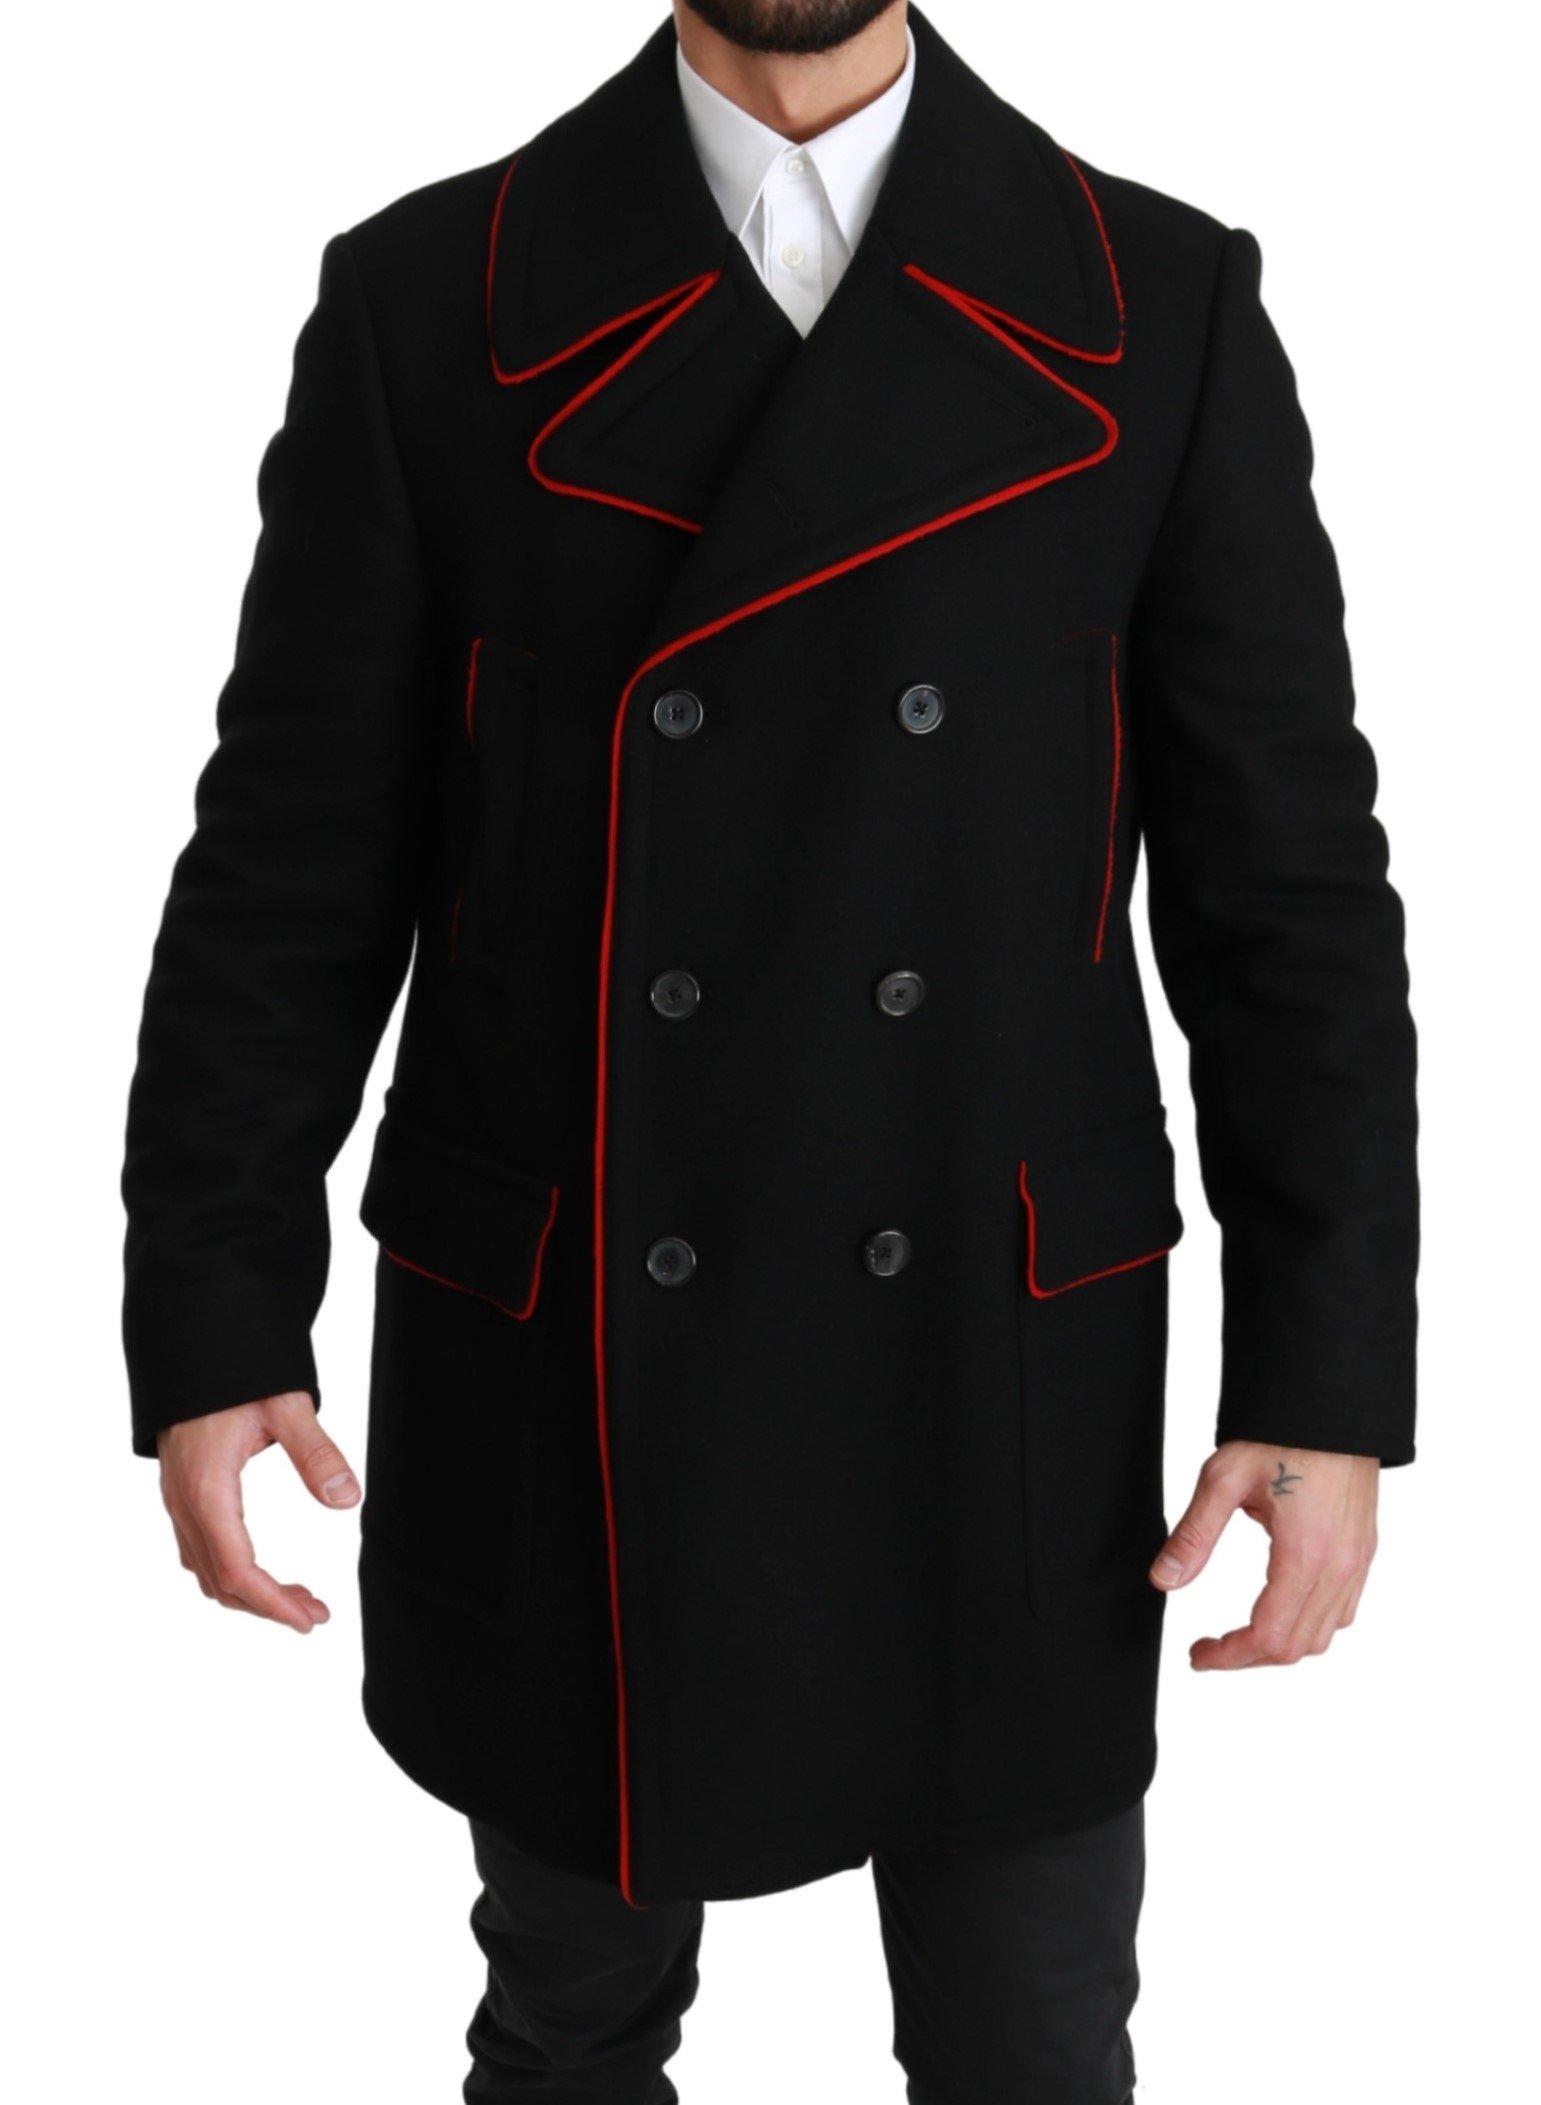 Dolce & Gabbana Men's Wool Stretch Jacket Black KOS1660 - IT50 | L